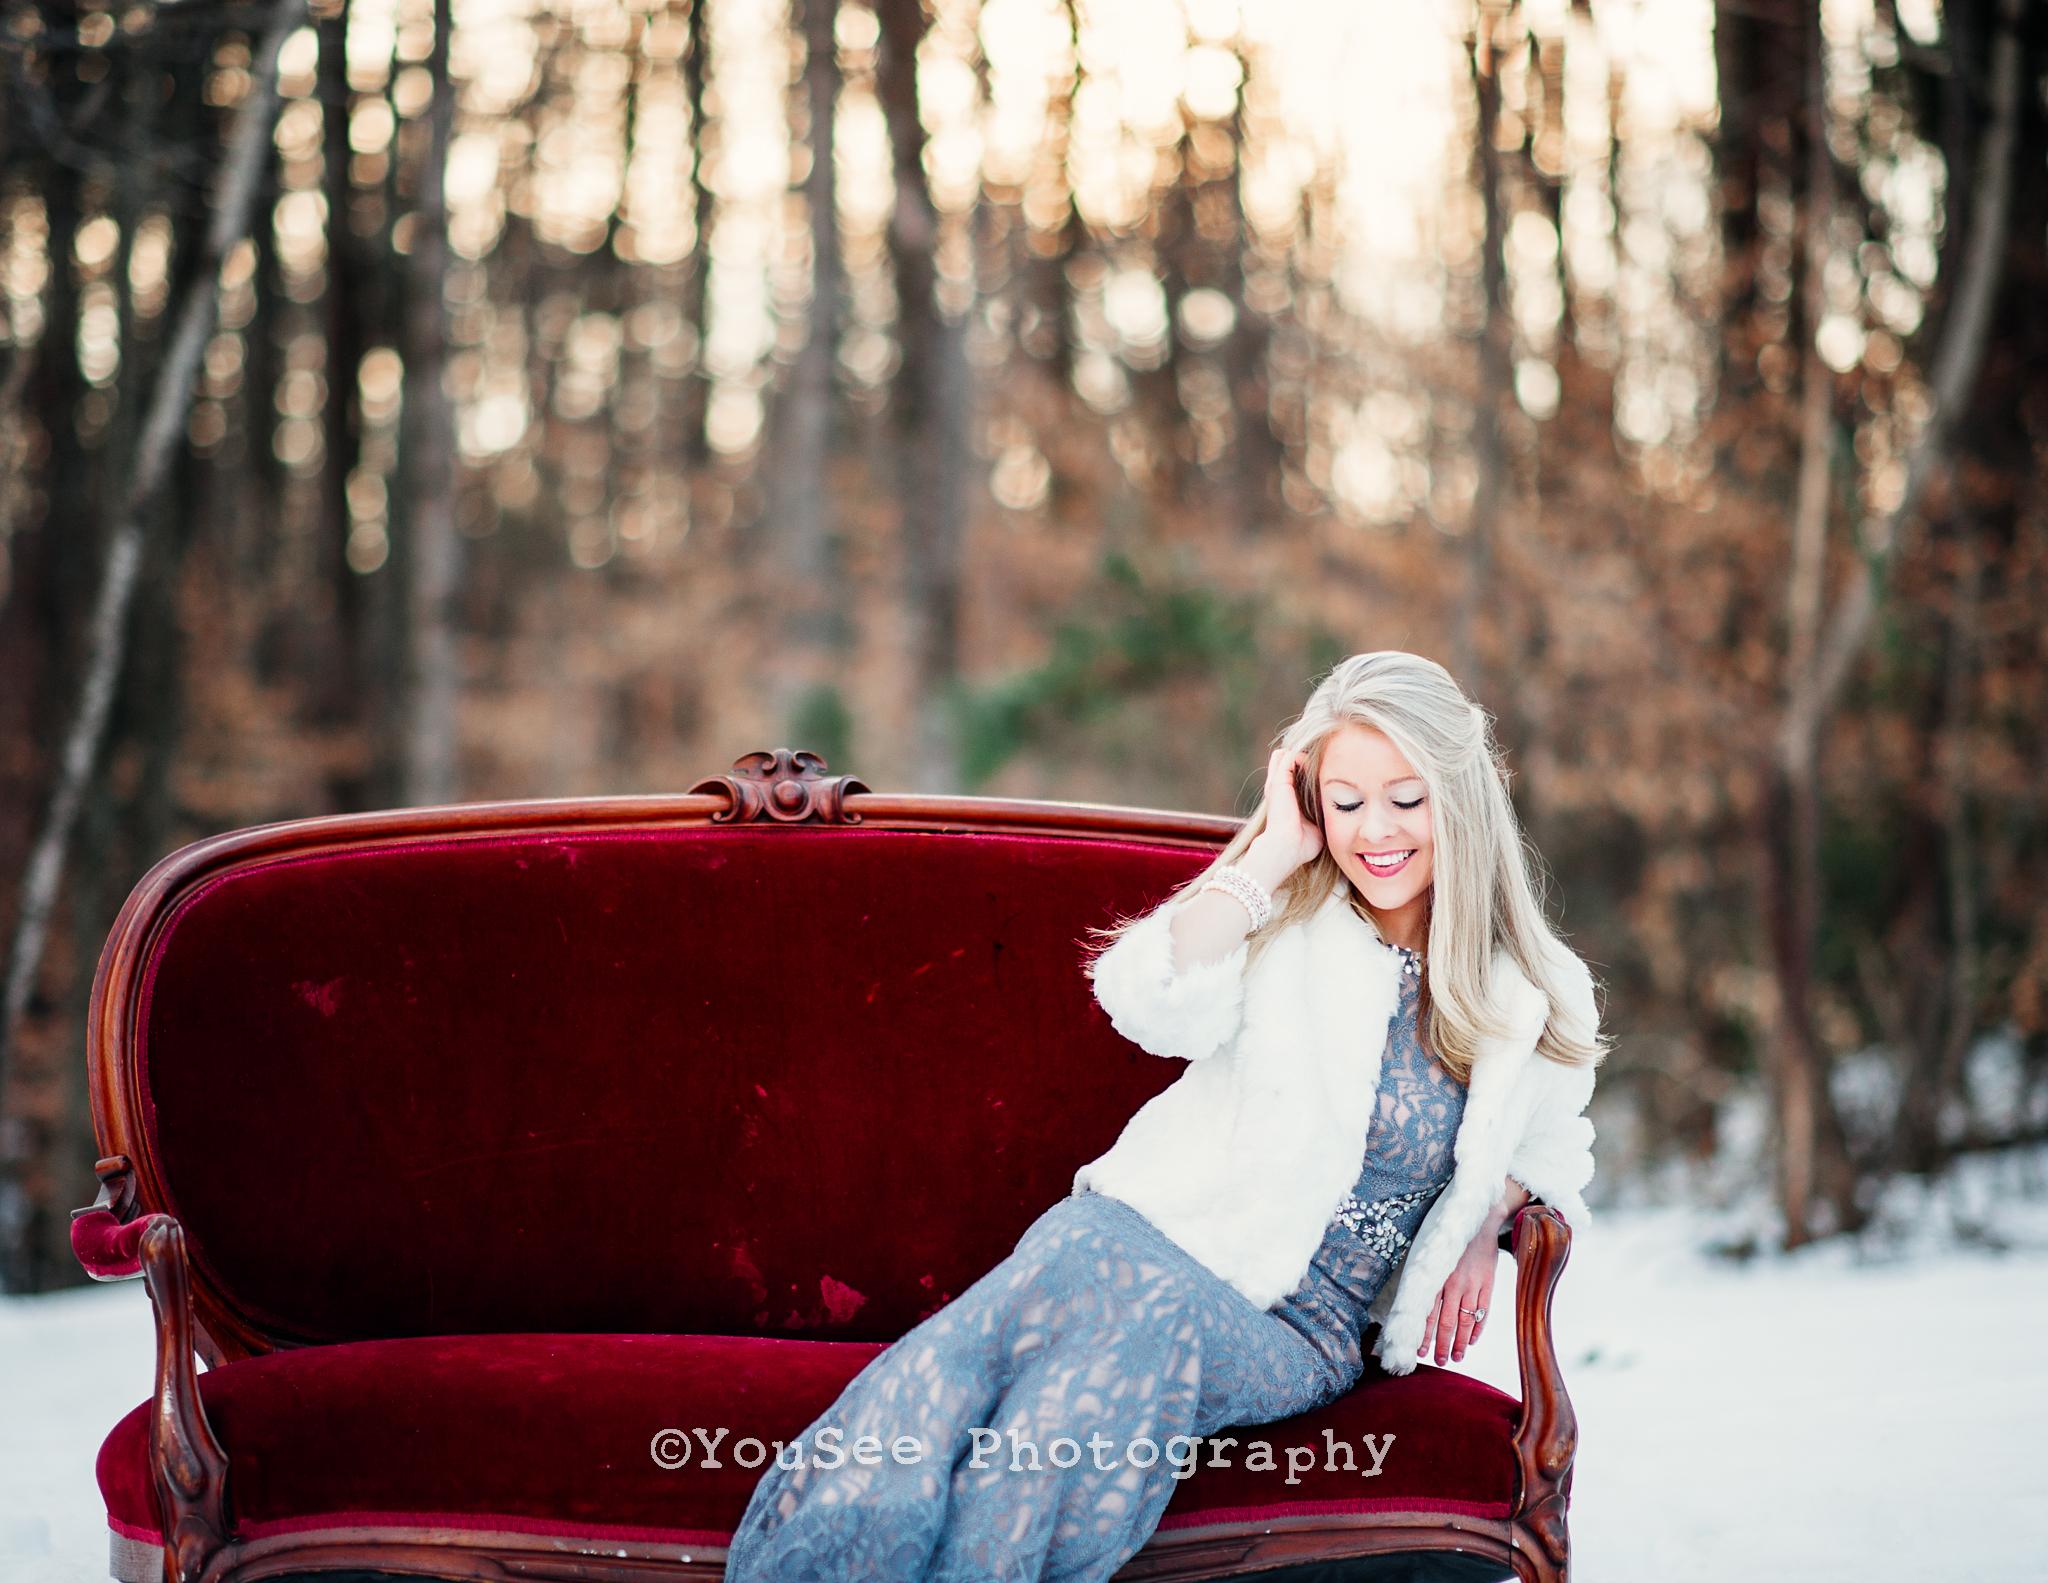 seniorportrait_fredericksburg_photography_winter2 (22)